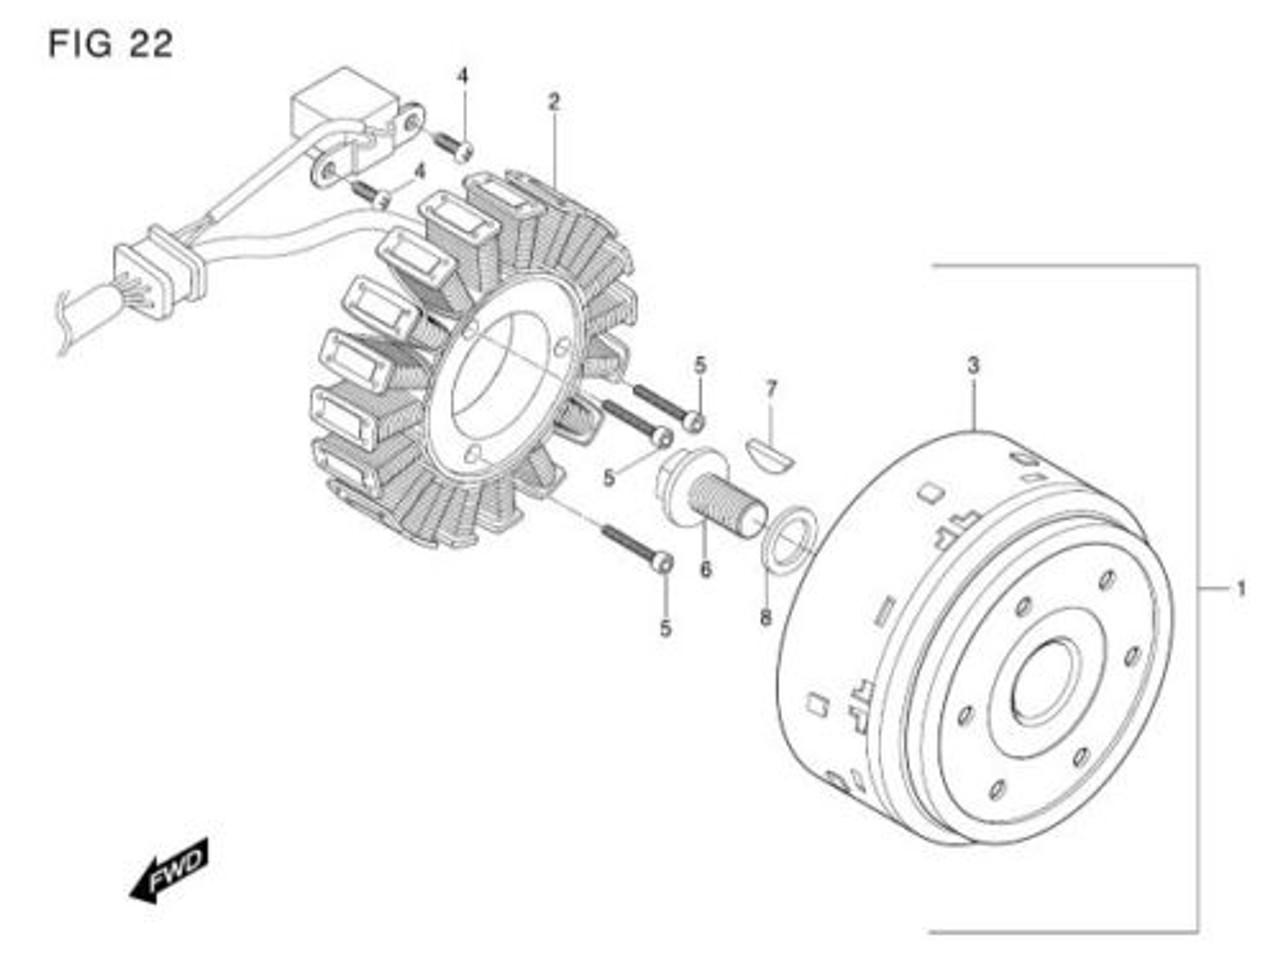 Magneto Flywheel Stator GT650R GT650 2009 2010 2011 2012